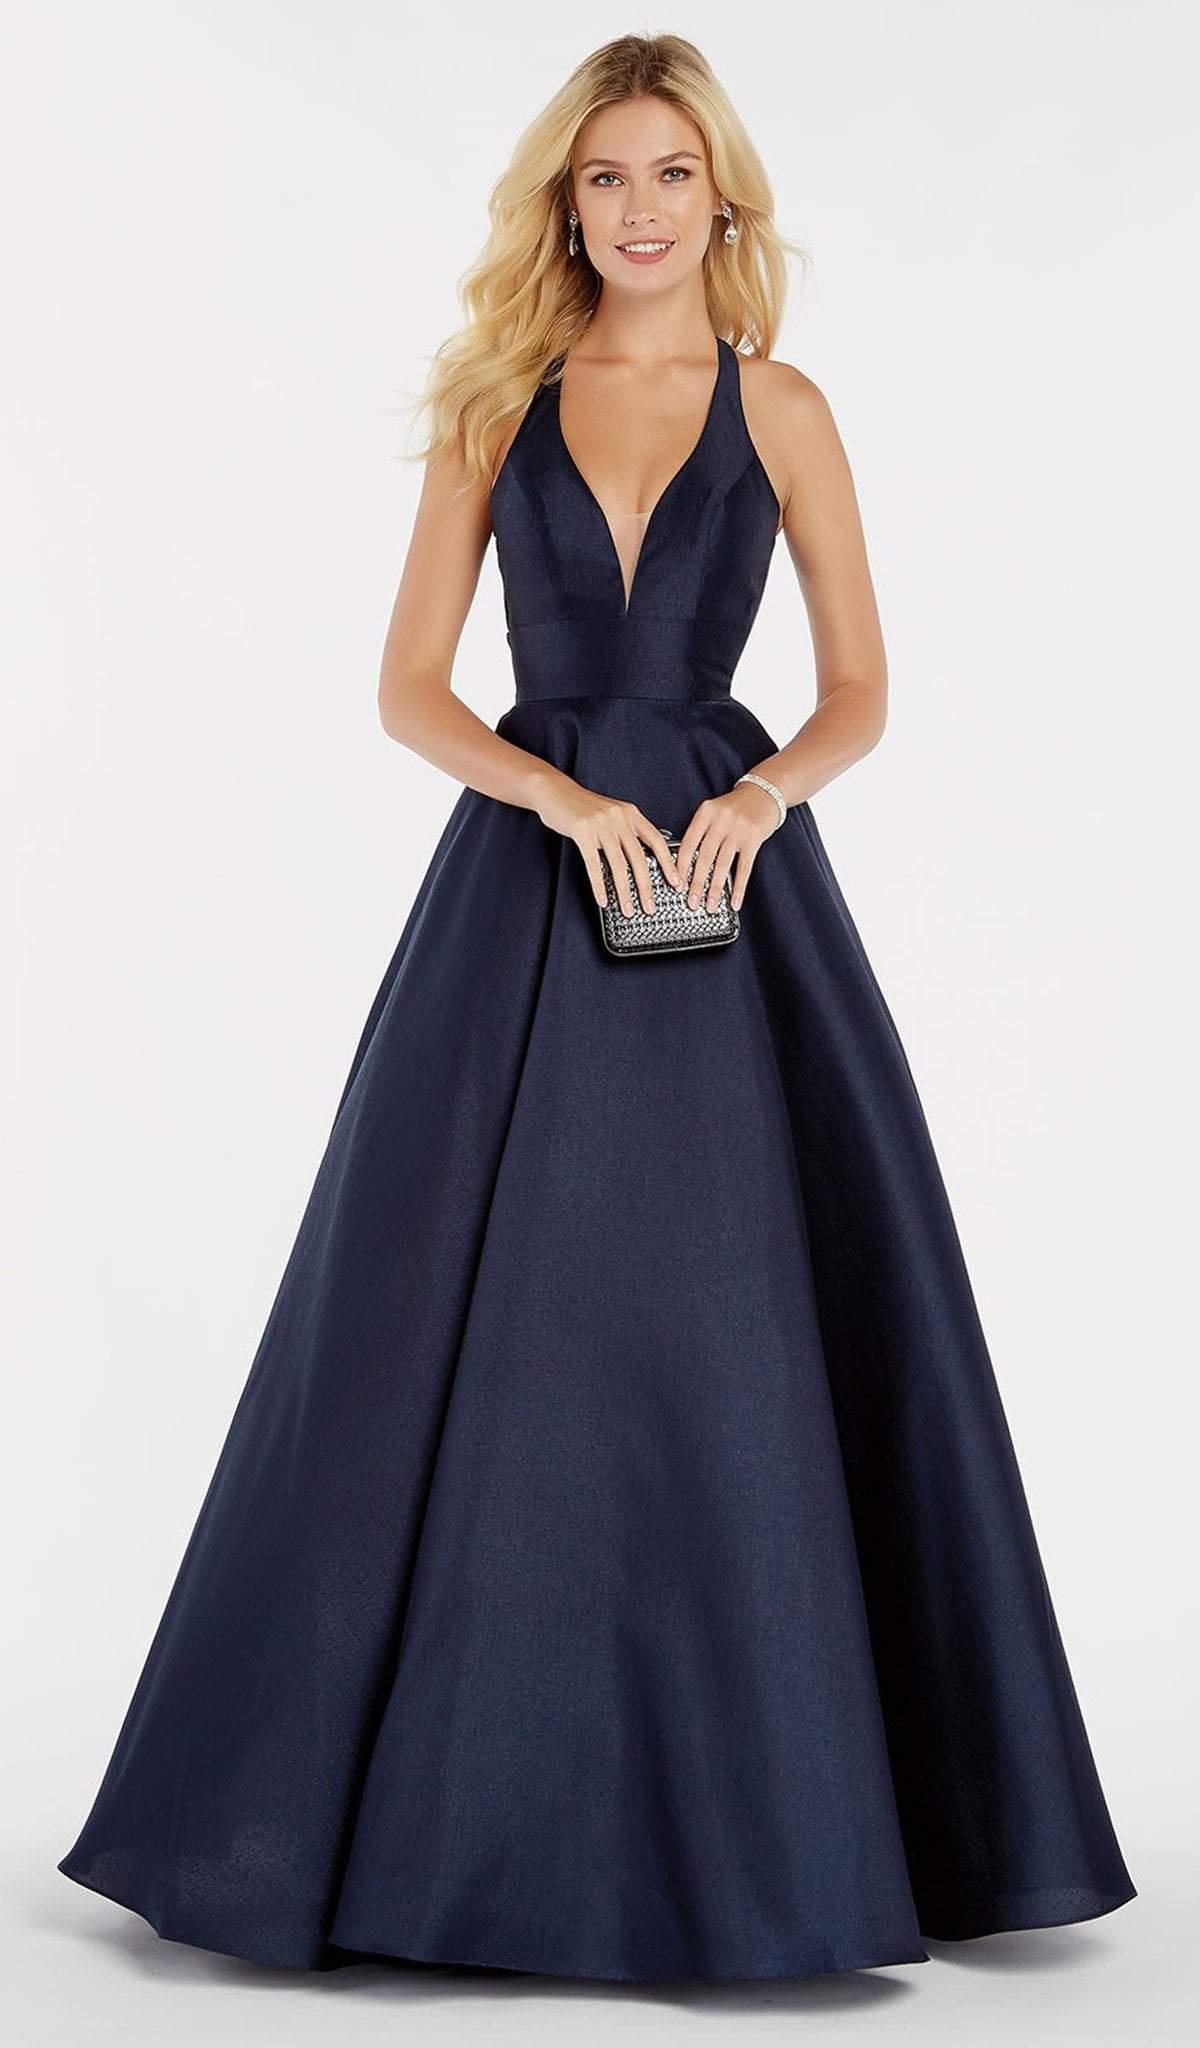 Alyce Paris - 60393 Halter Neck Vibrant Shantung A-Line Prom Dress